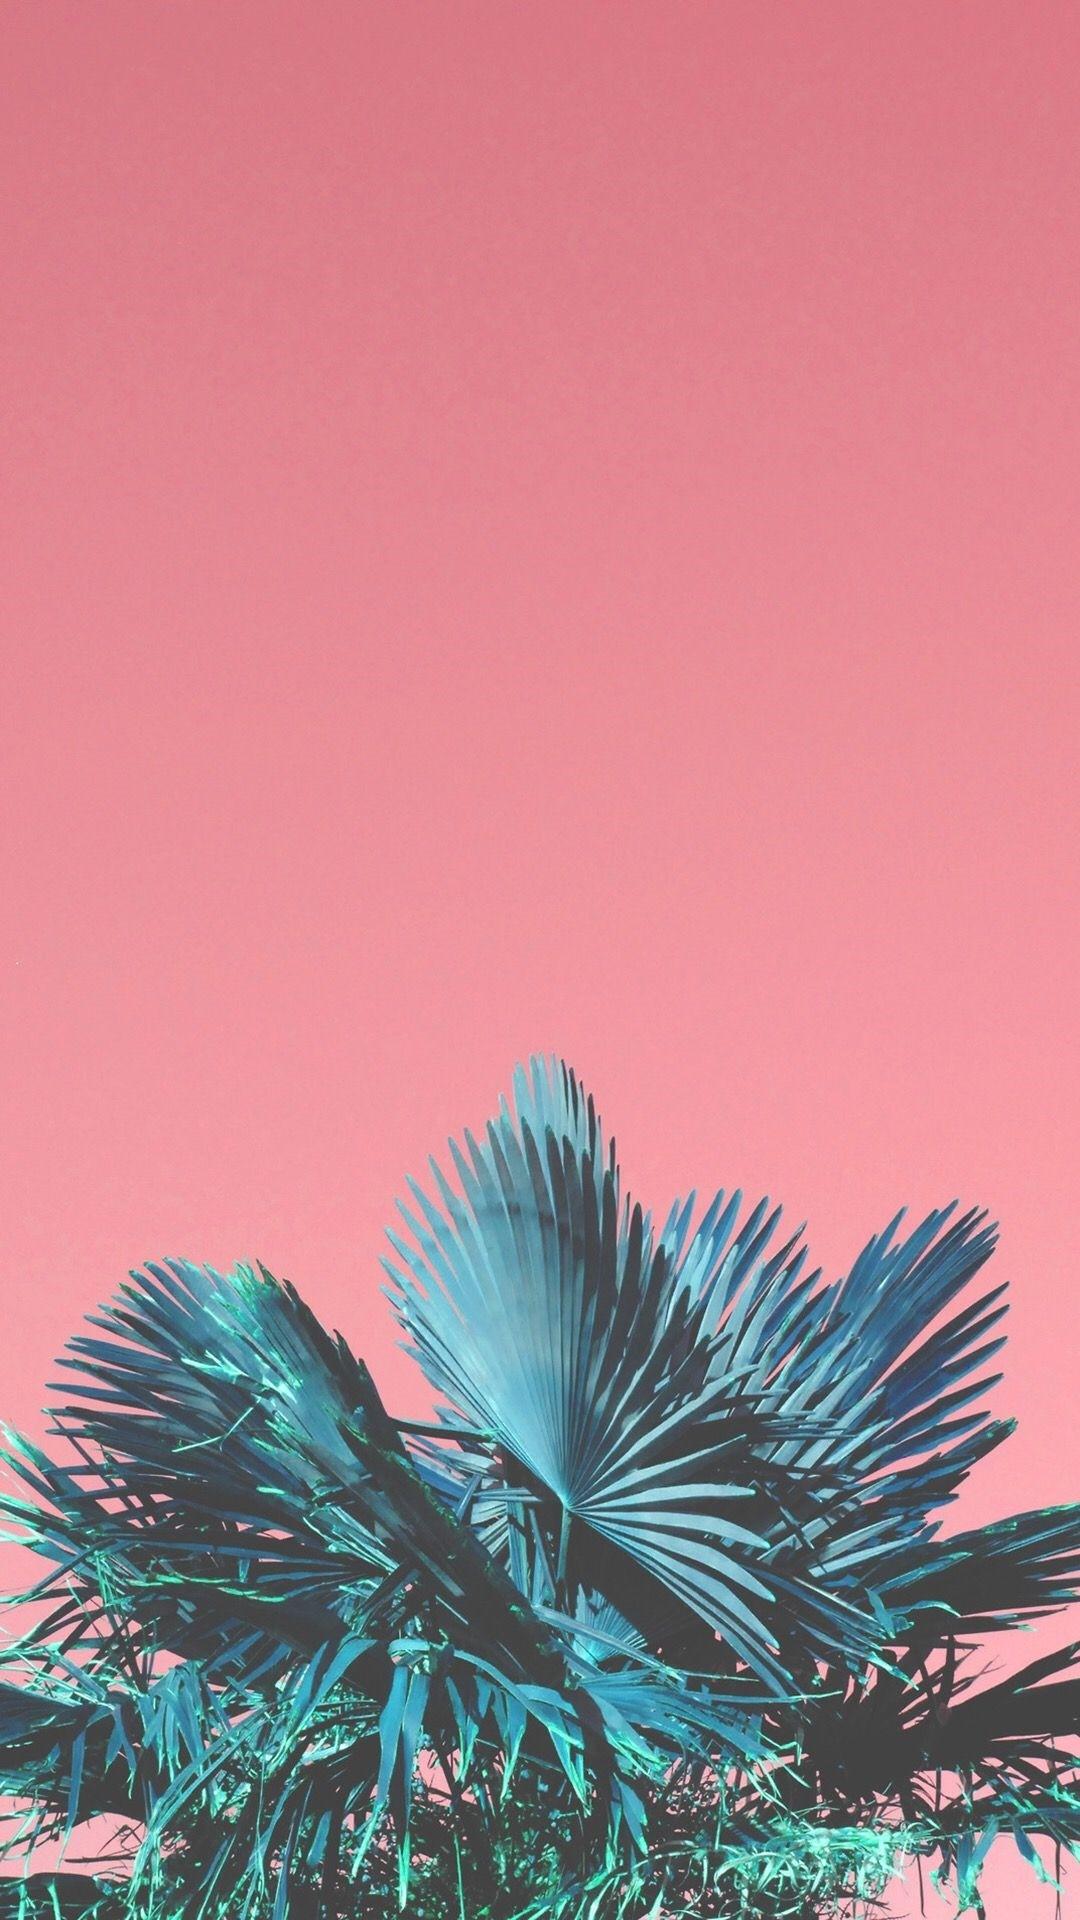 Cool Lockscreens wallpaper